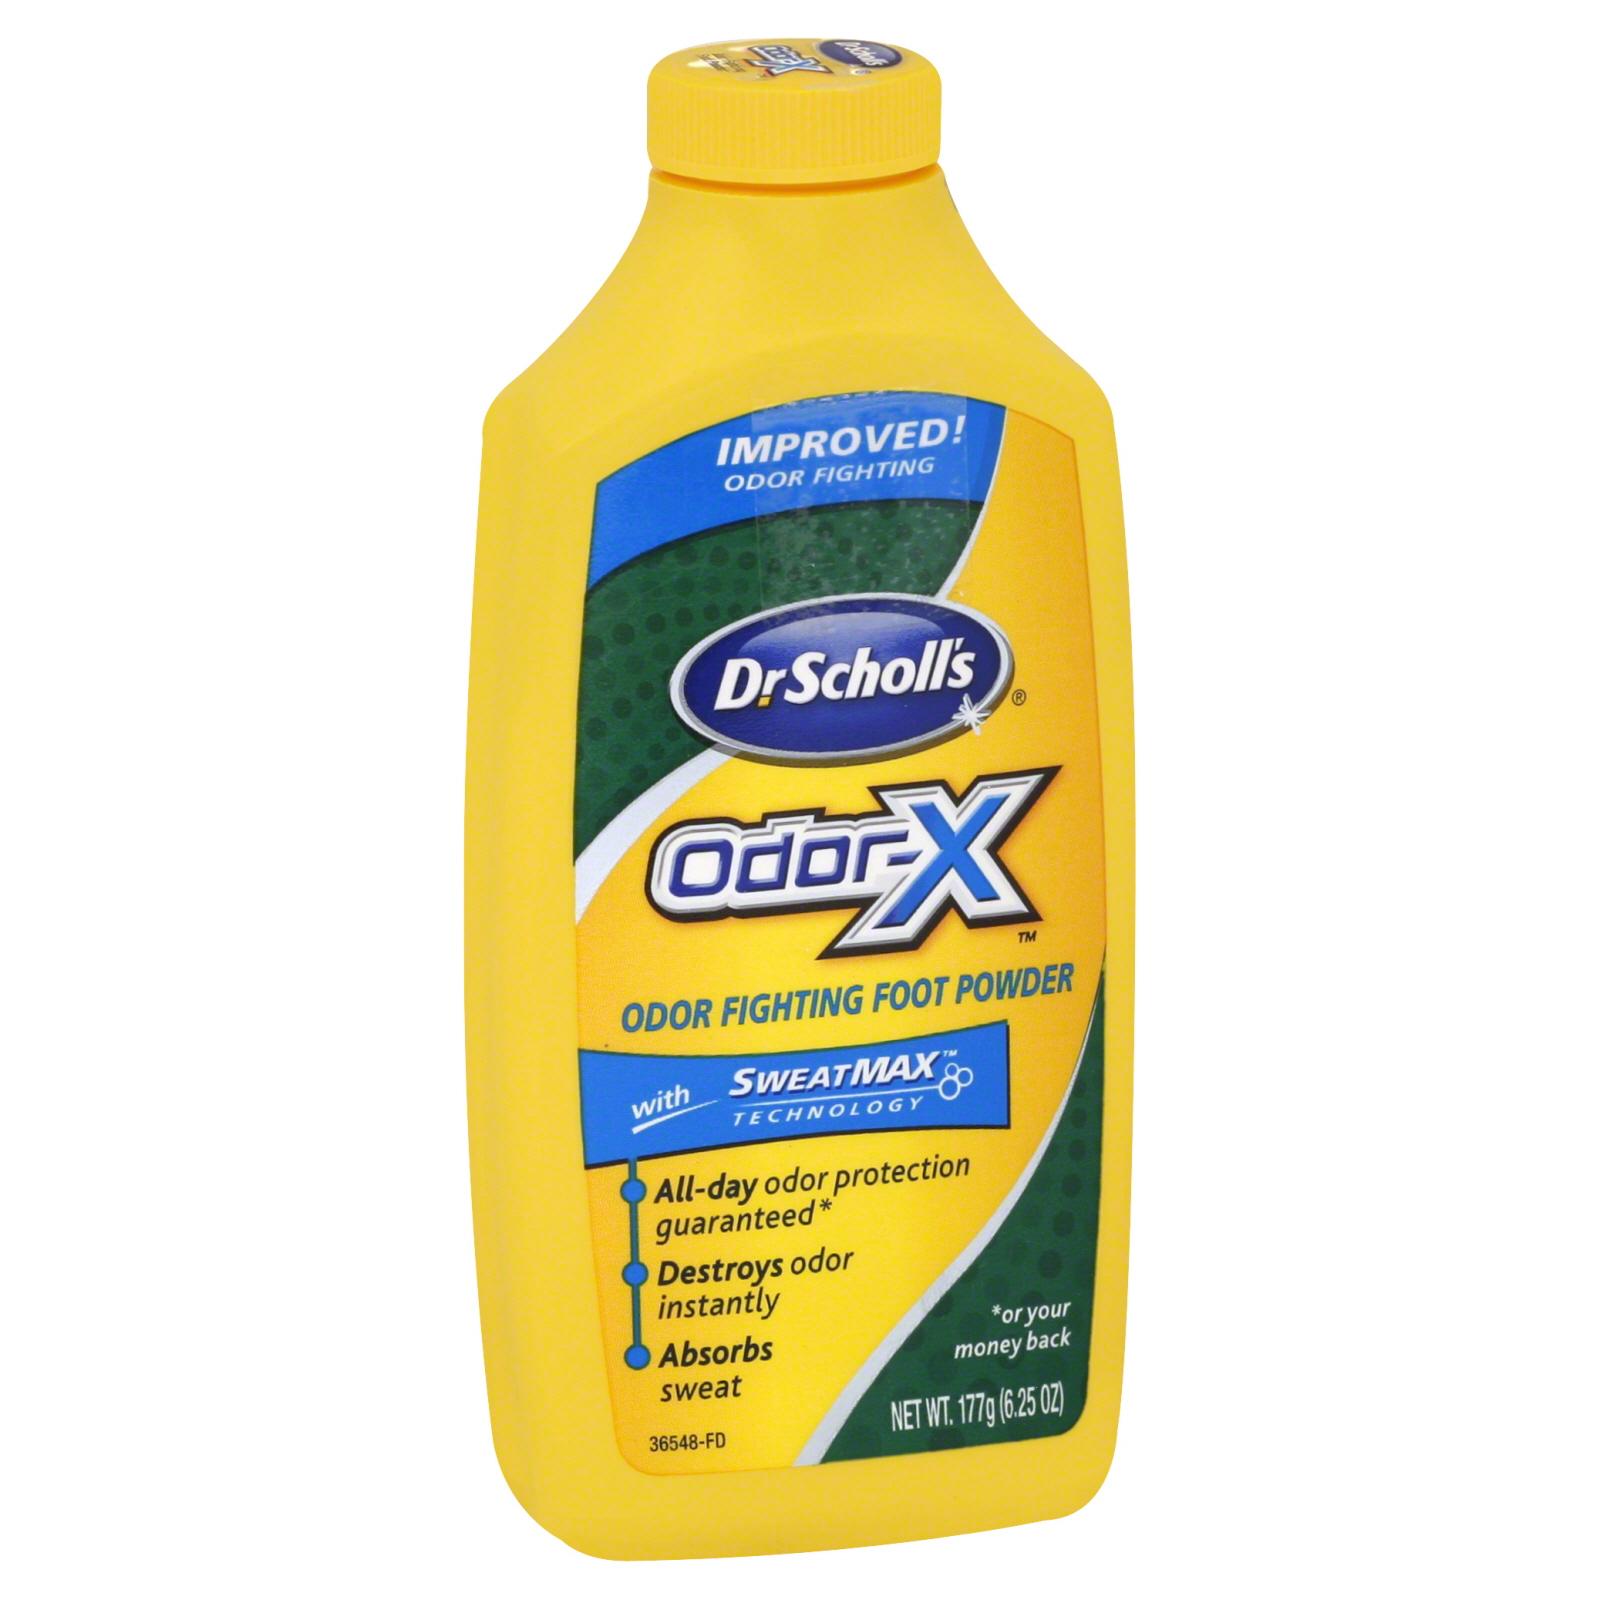 Dr. Scholl's Odor-X Foot Powder, Odor